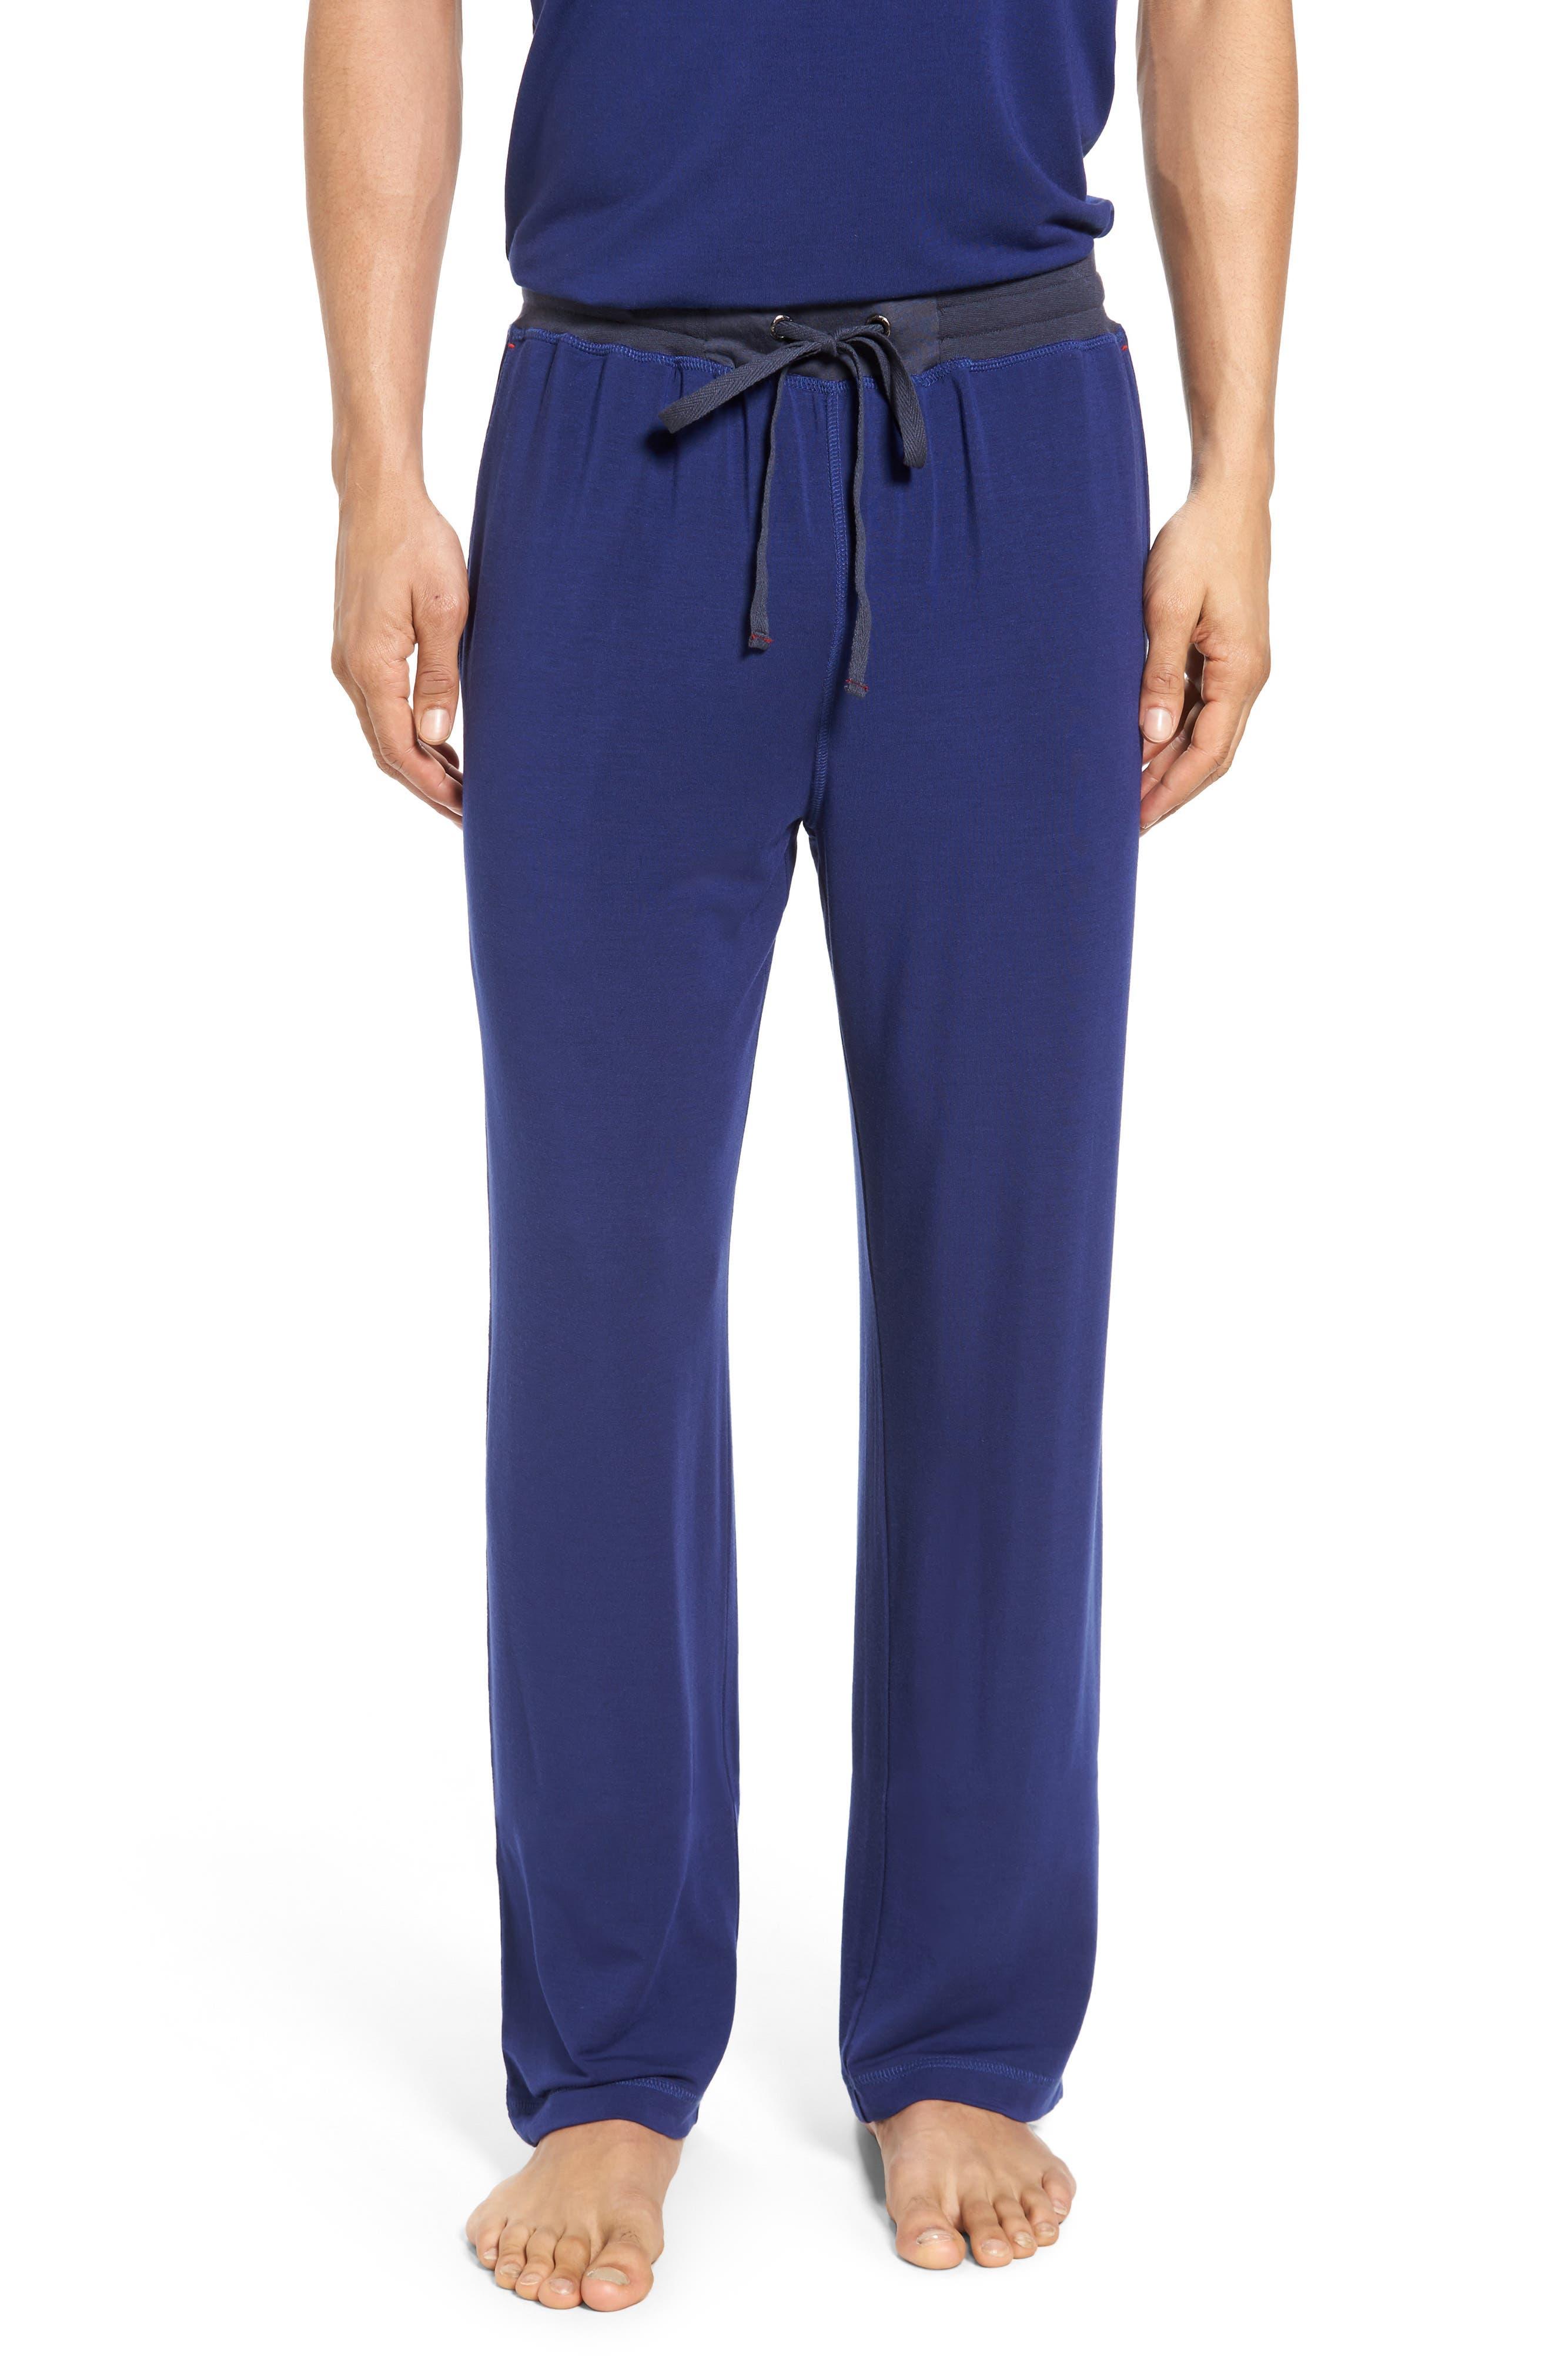 Alternate Image 1 Selected - Daniel Buchler Lounge Pants